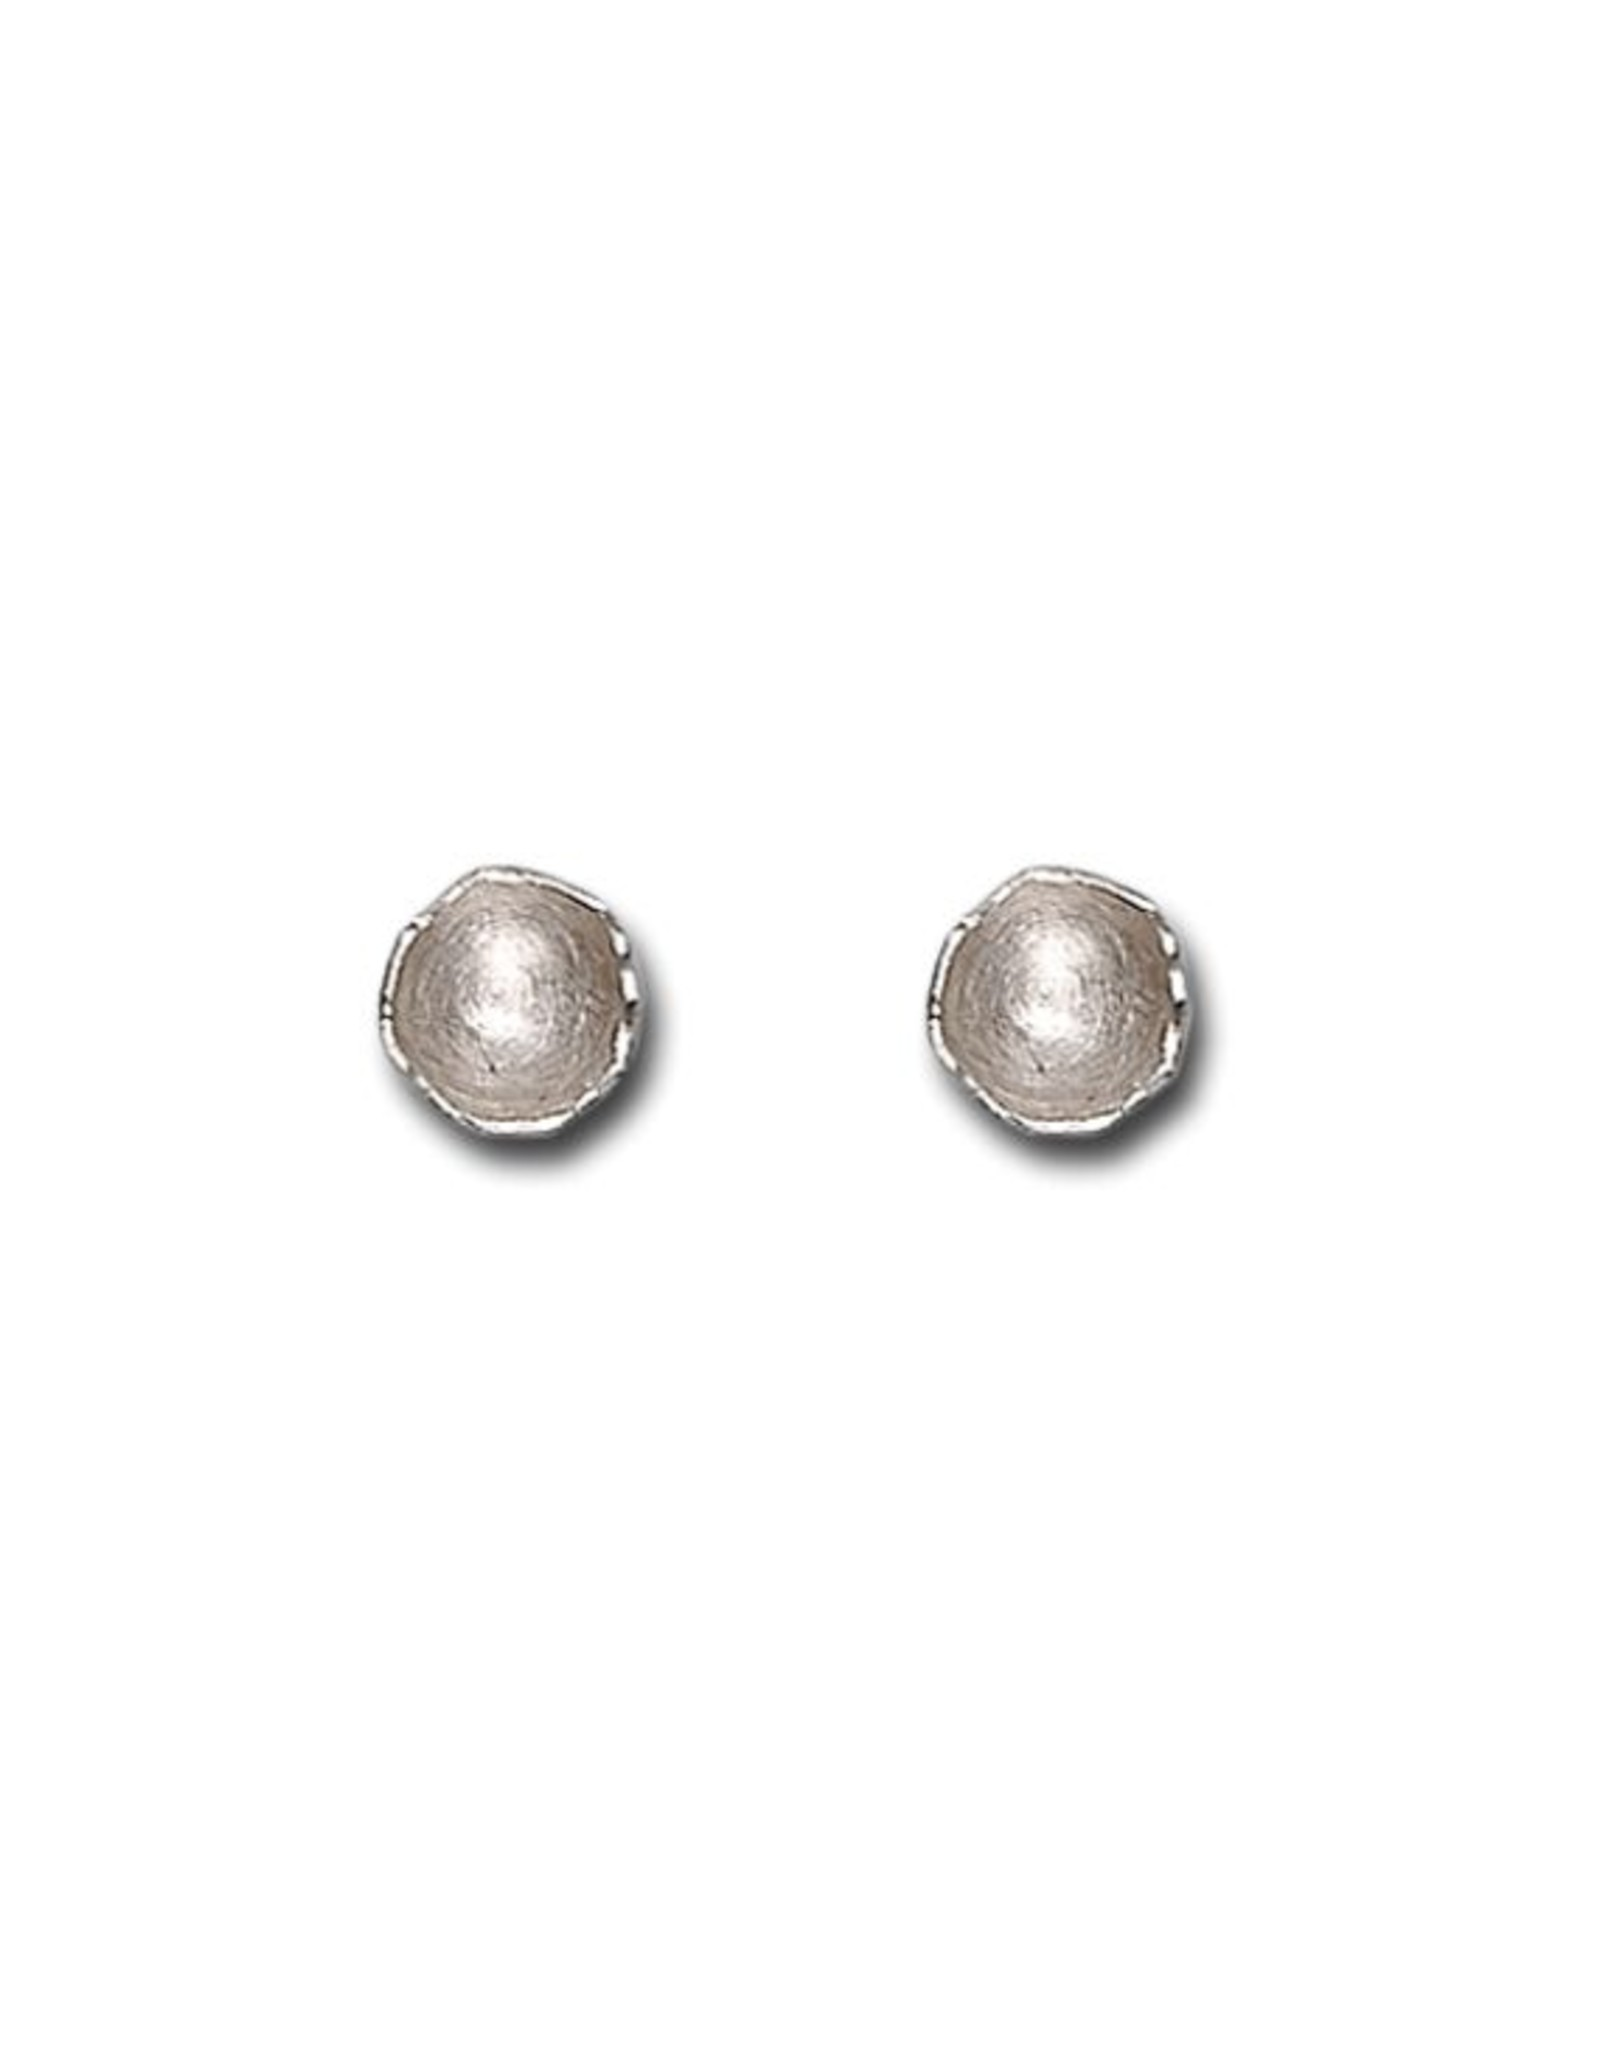 Himatsingka Fragment Silver Earrings - Small